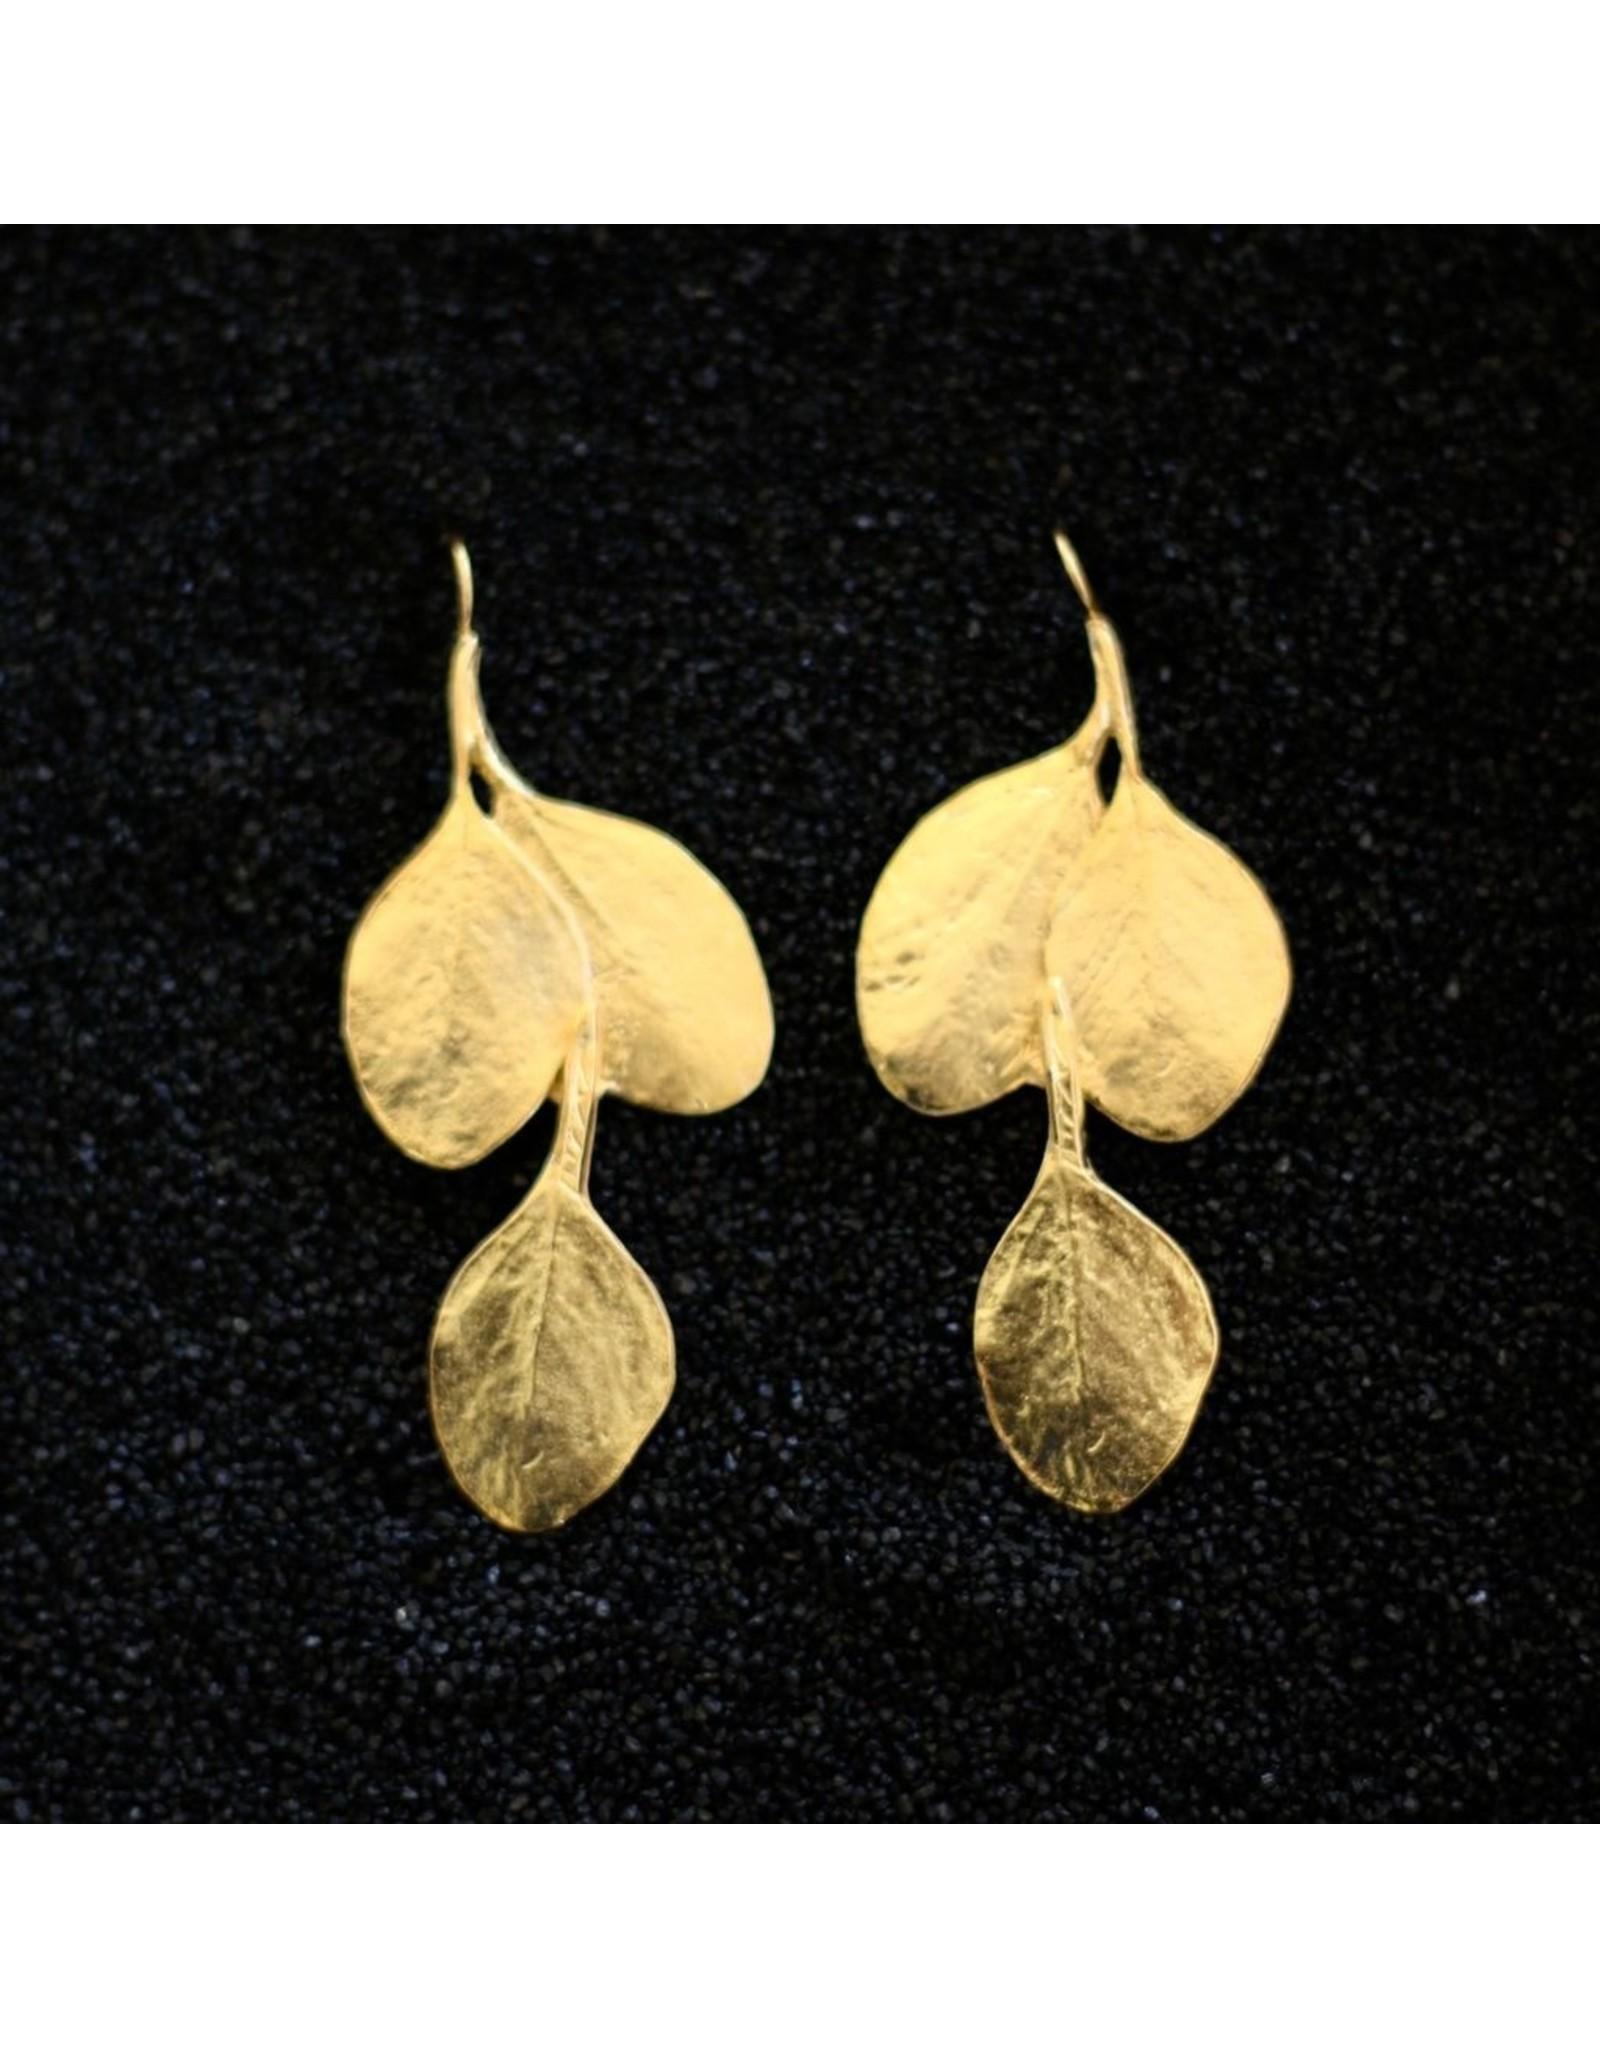 Kenneth Jay Lane KJLane: Gold Leaf Double prcd